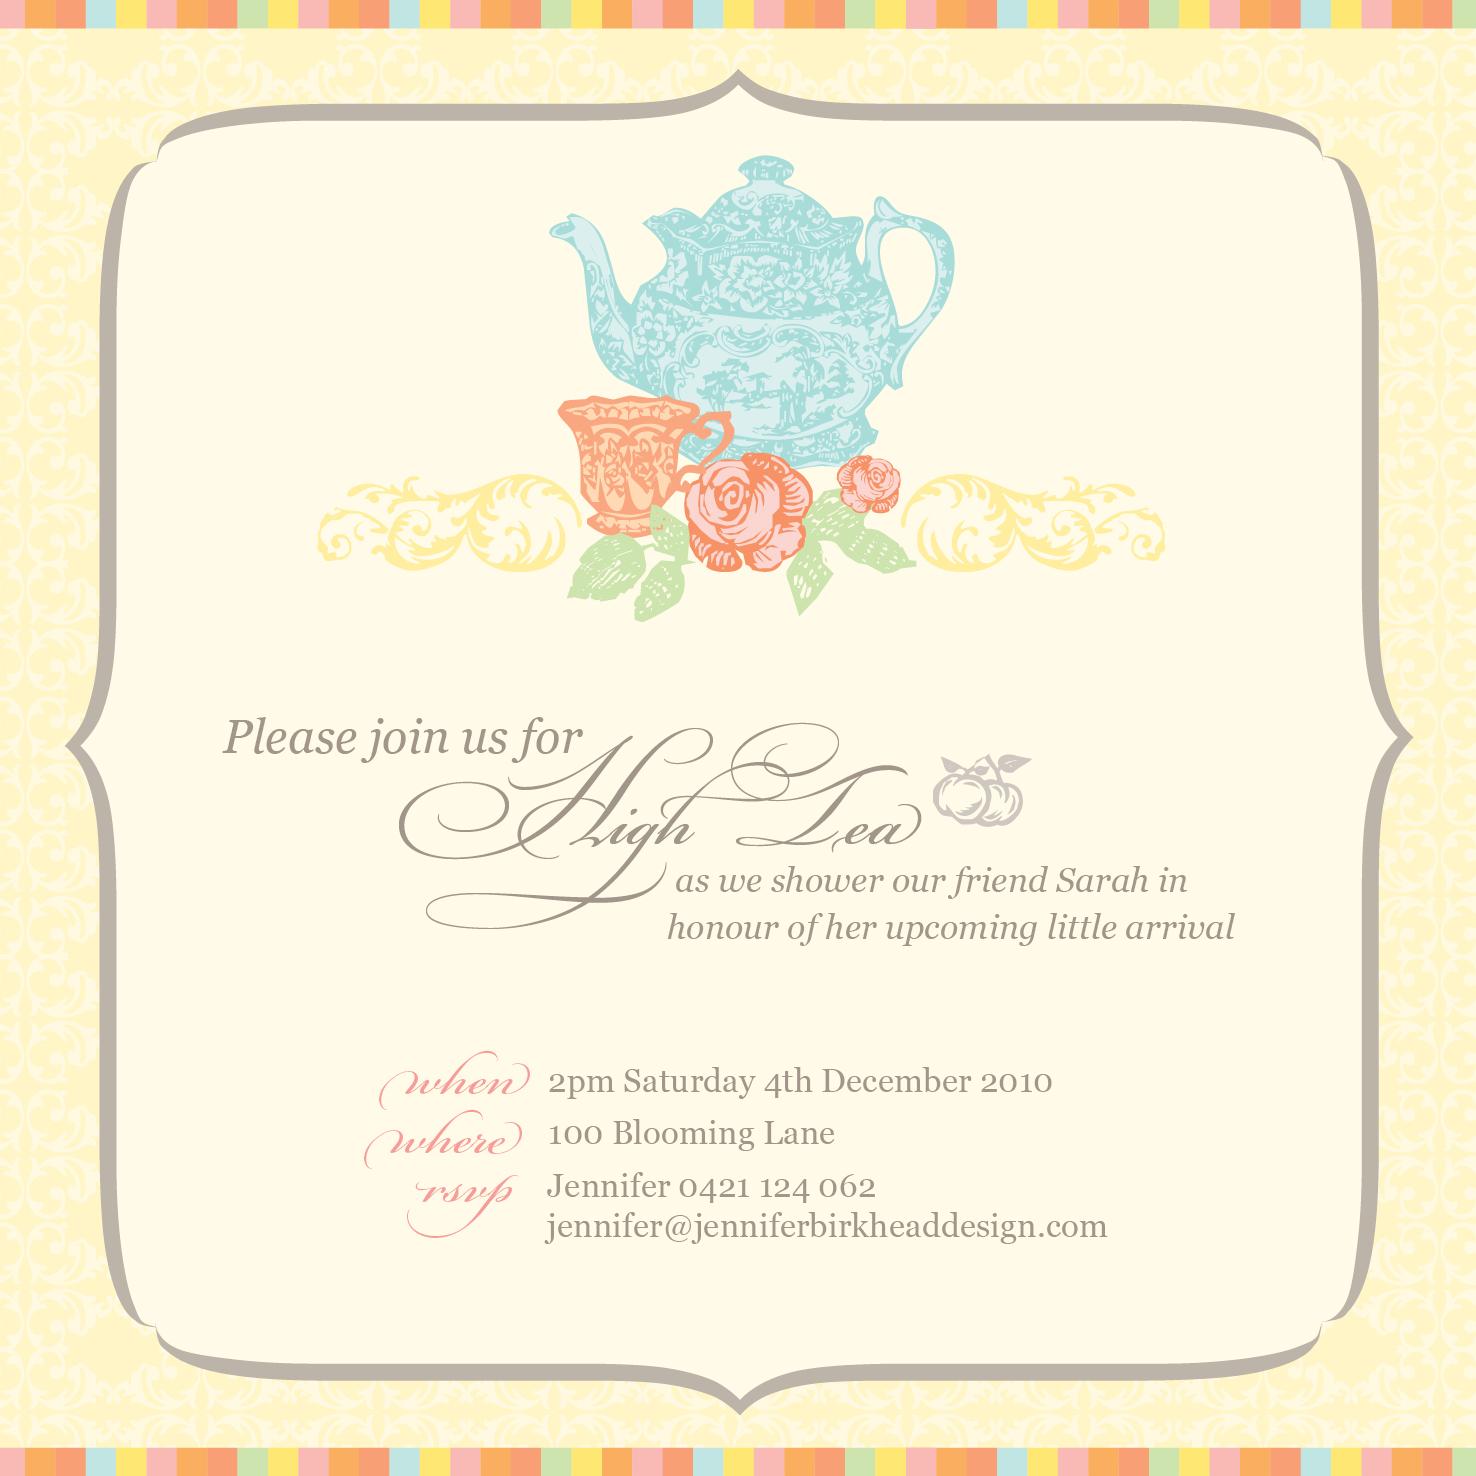 jenniferbirkheaddesign High Tea baby shower